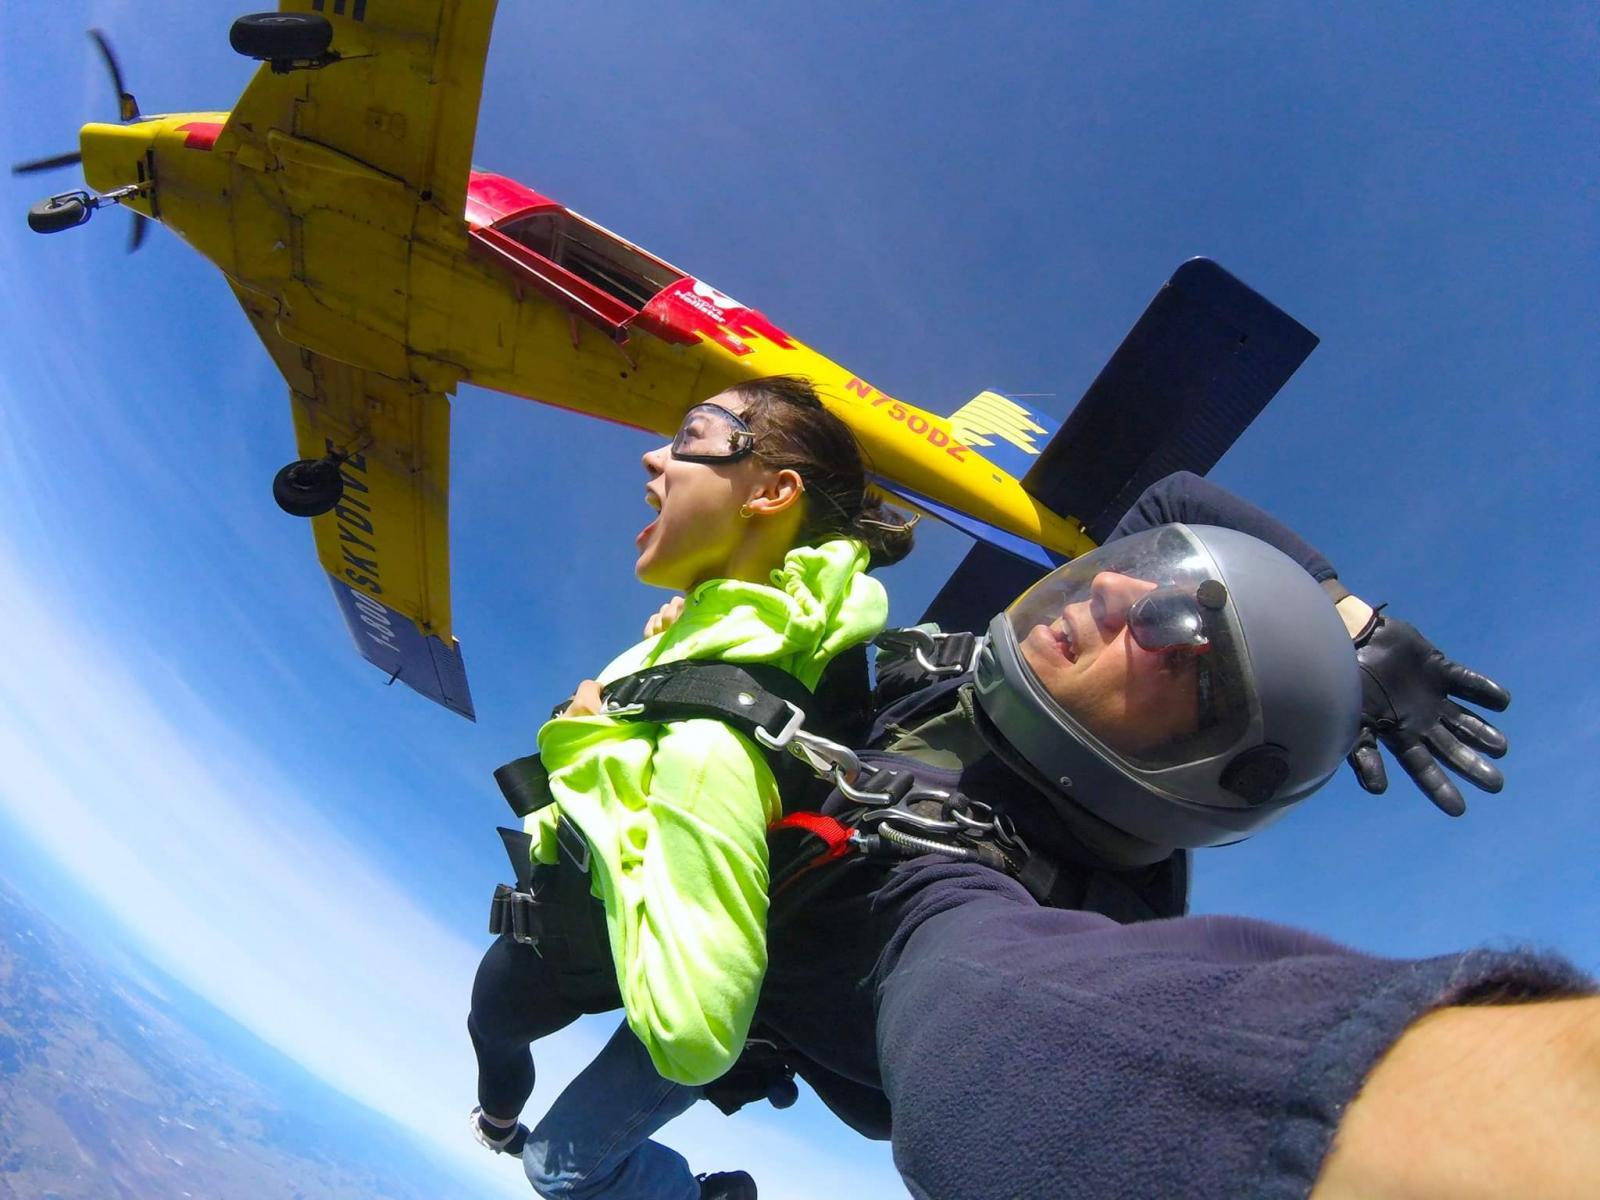 Tandem skydiving exit at Skydive Hollister California